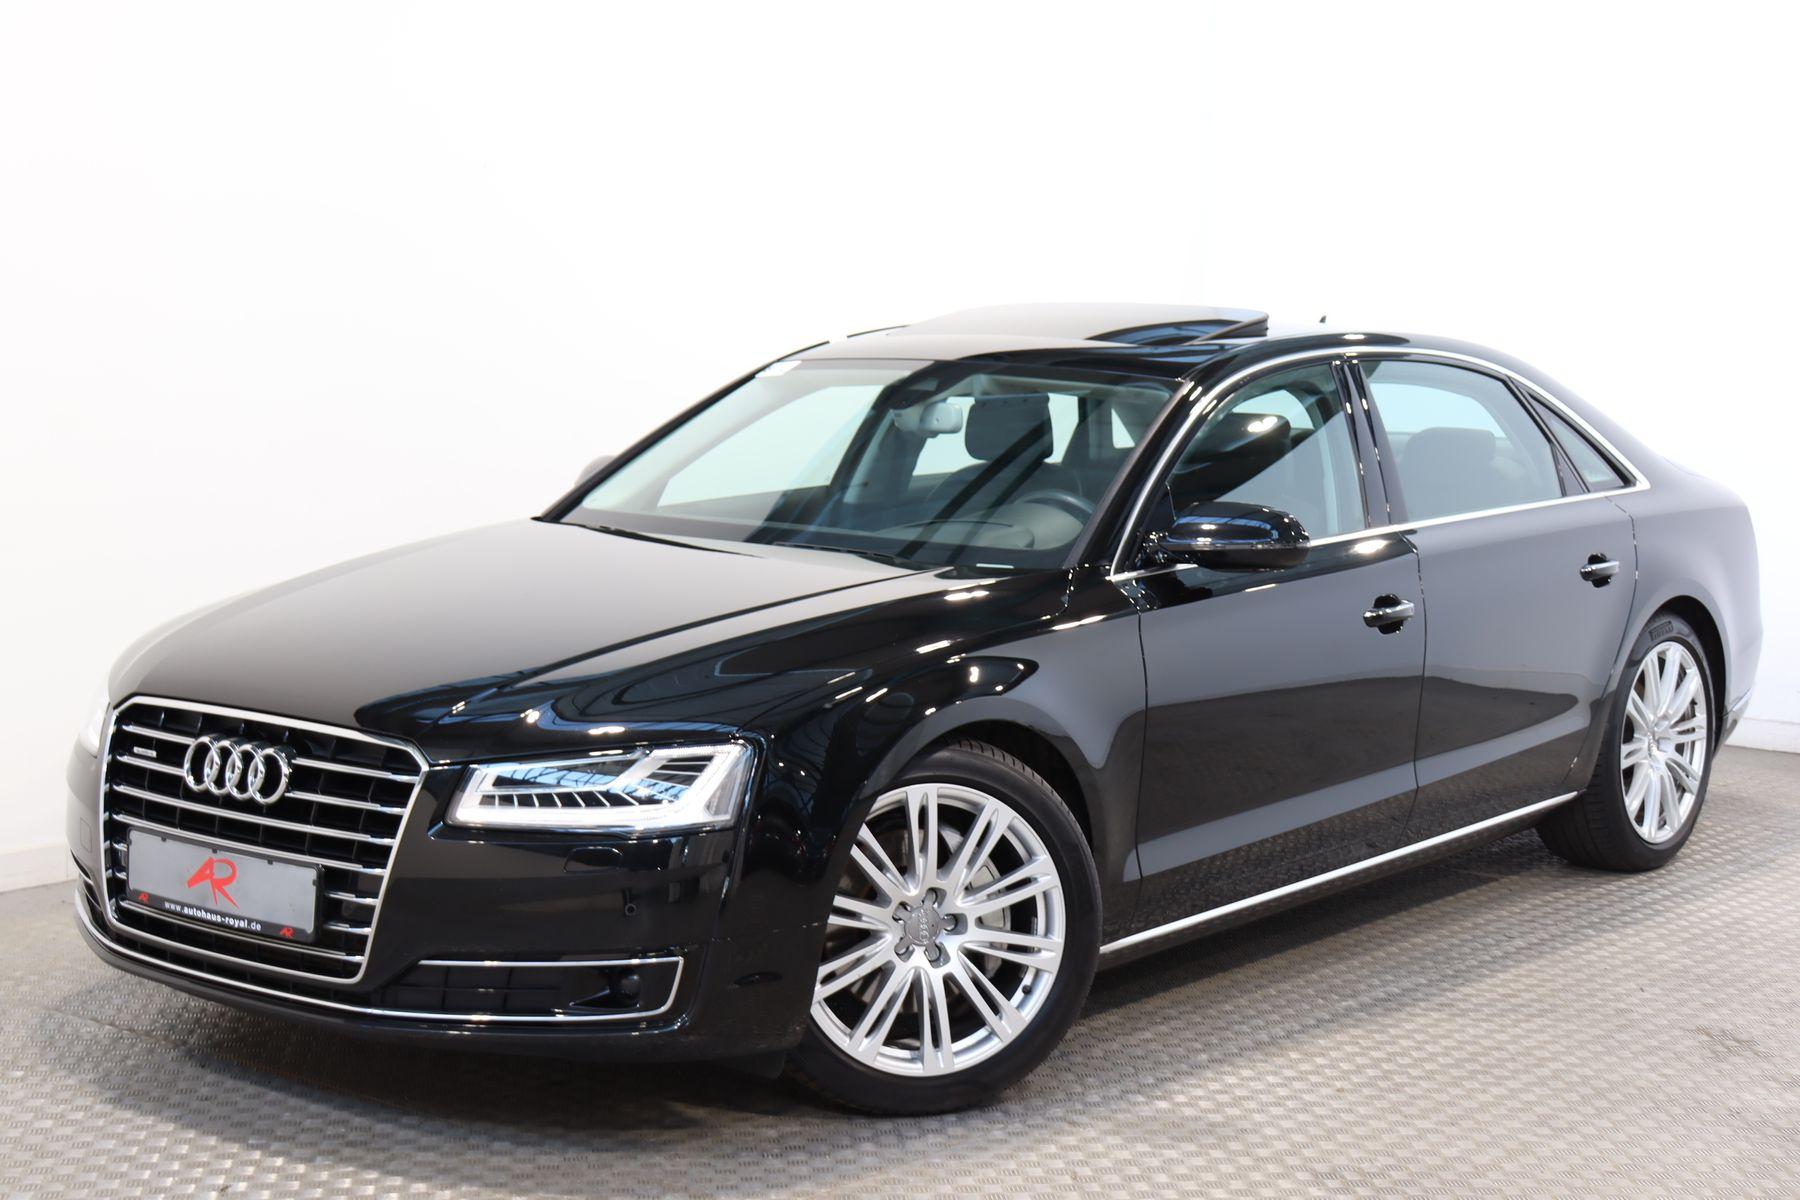 Audi A8 3.0 TDI qu LANG NACHTSICHT,HUD,KEYLESS,MATRIX, Jahr 2015, Diesel